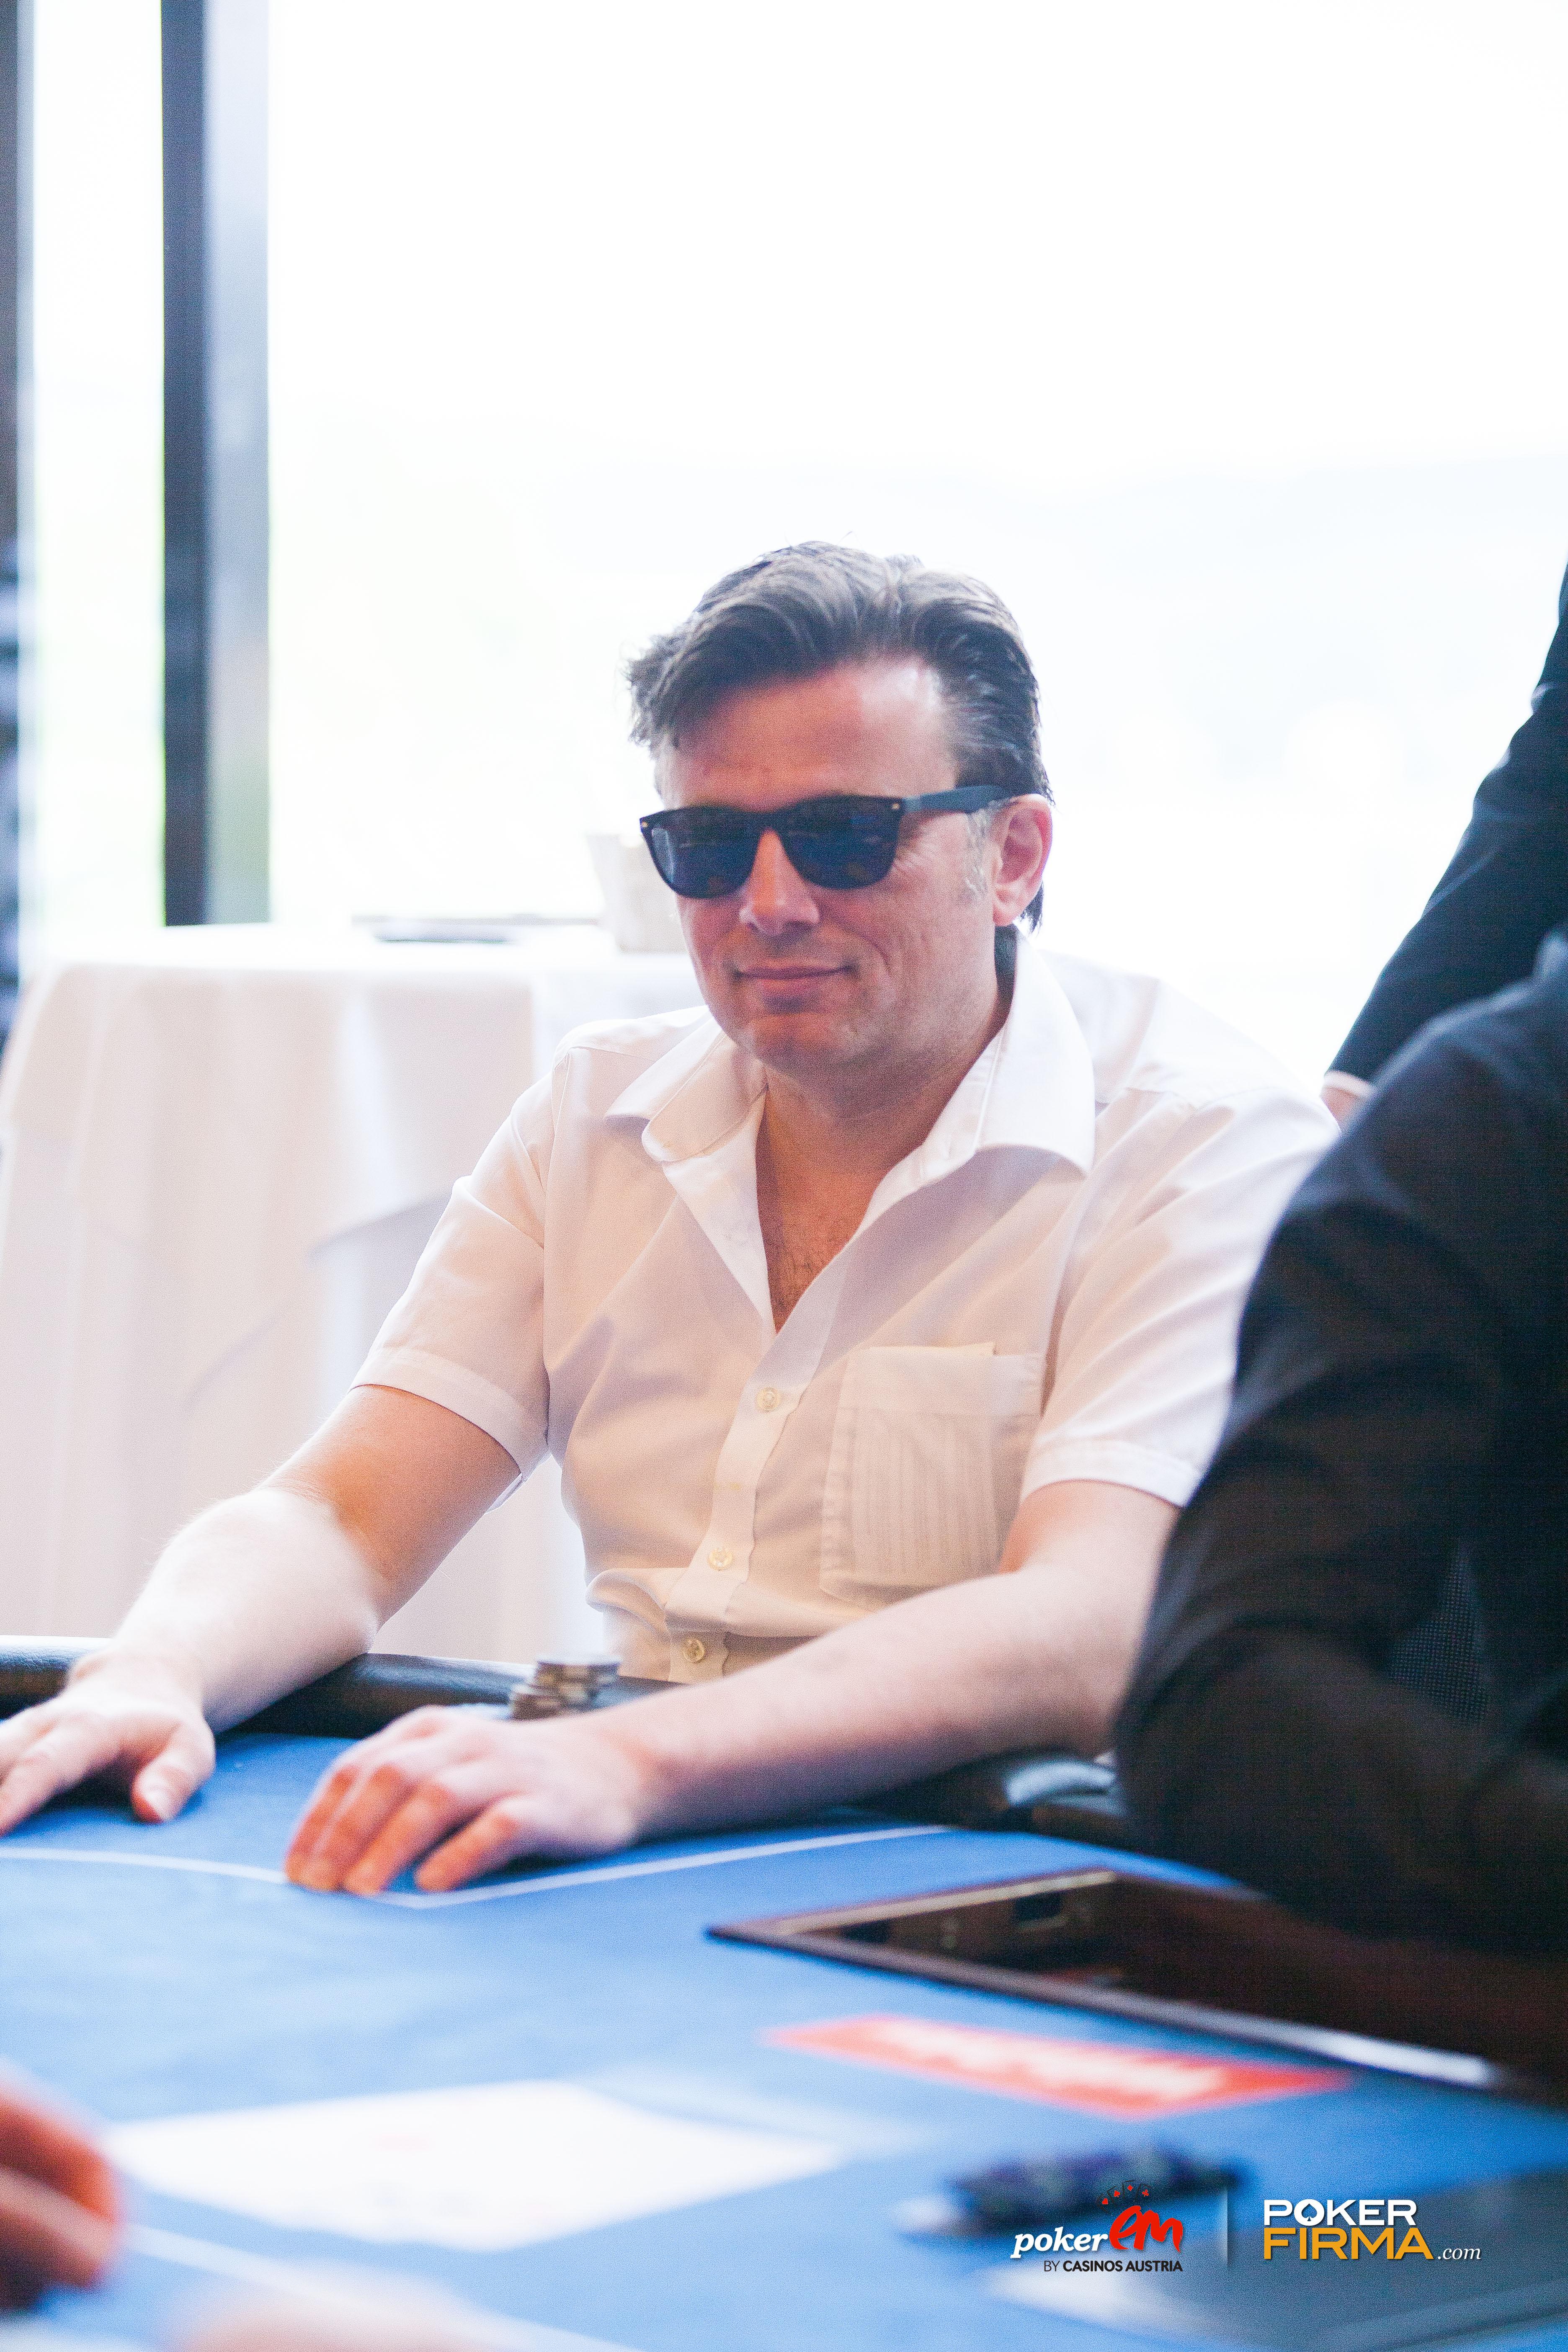 Tropicana online casino promotions